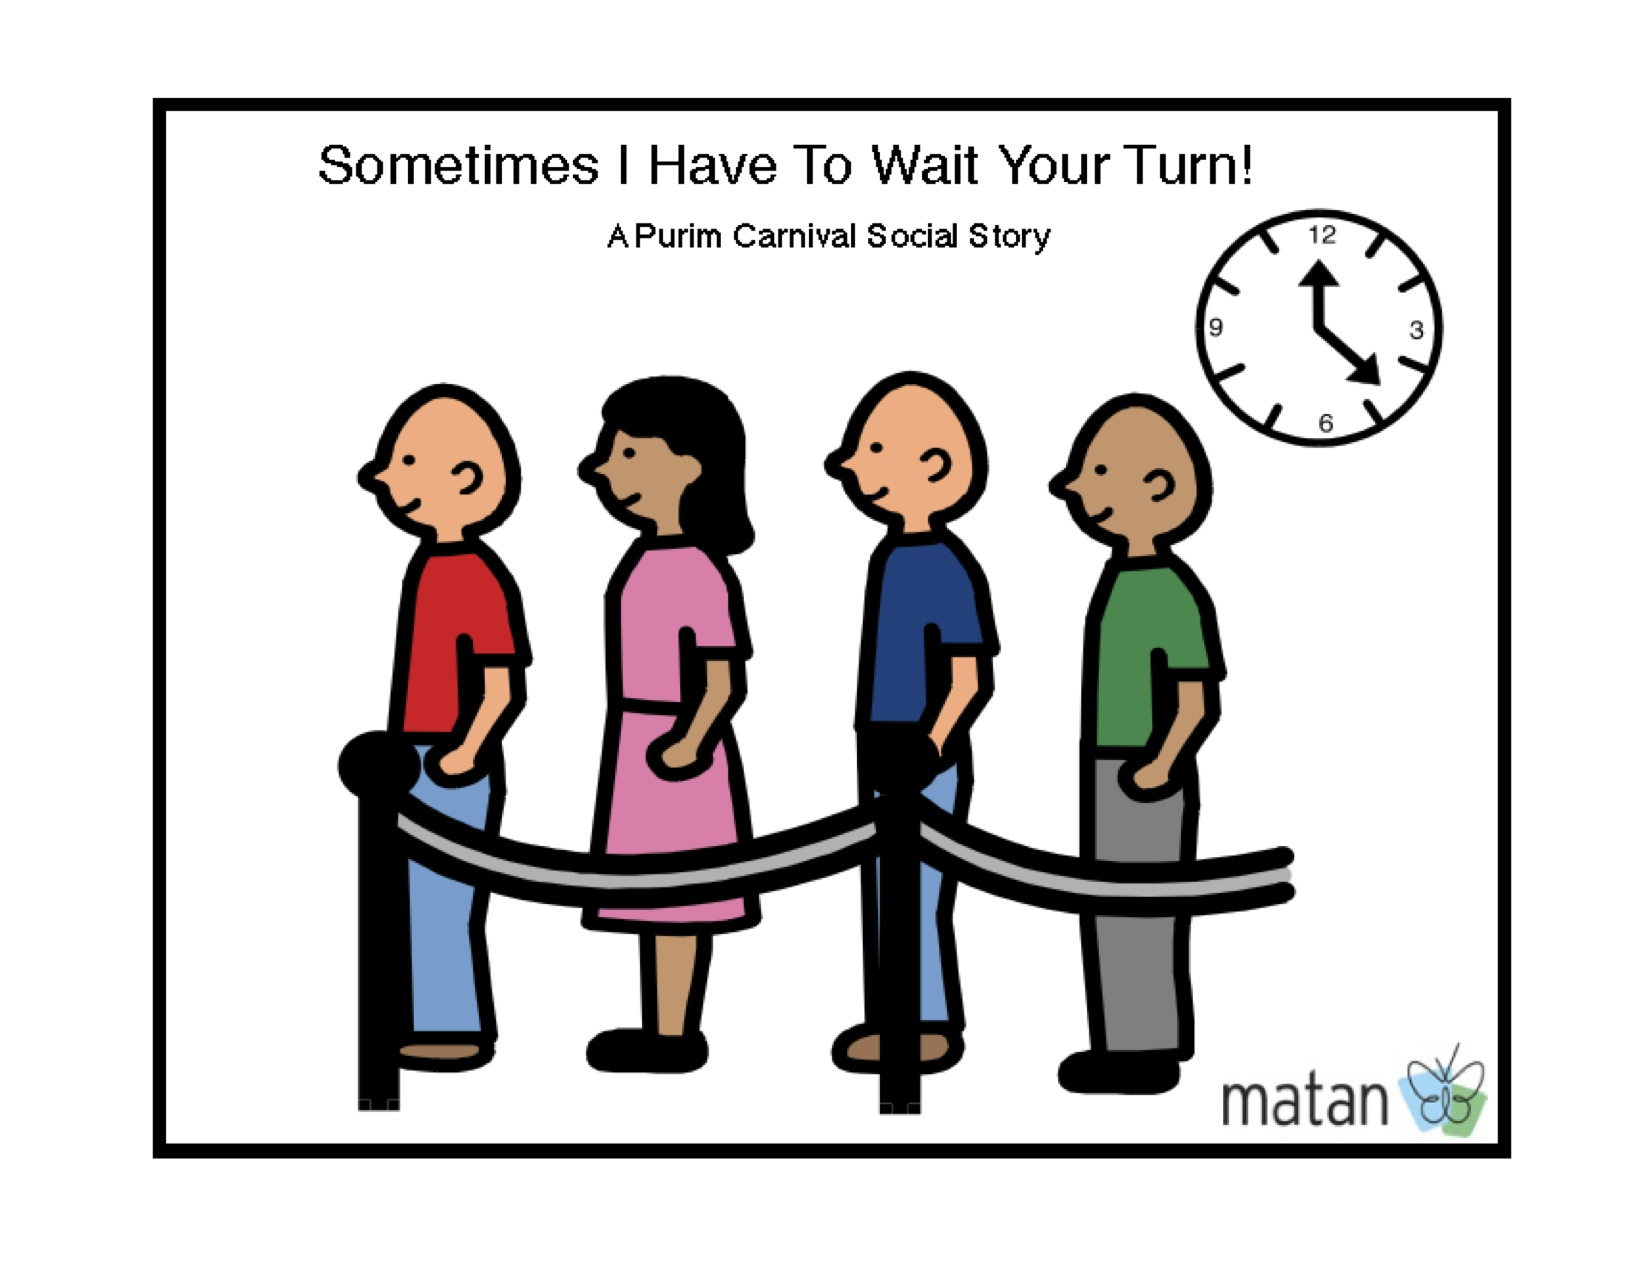 Purim Carnival Social Story